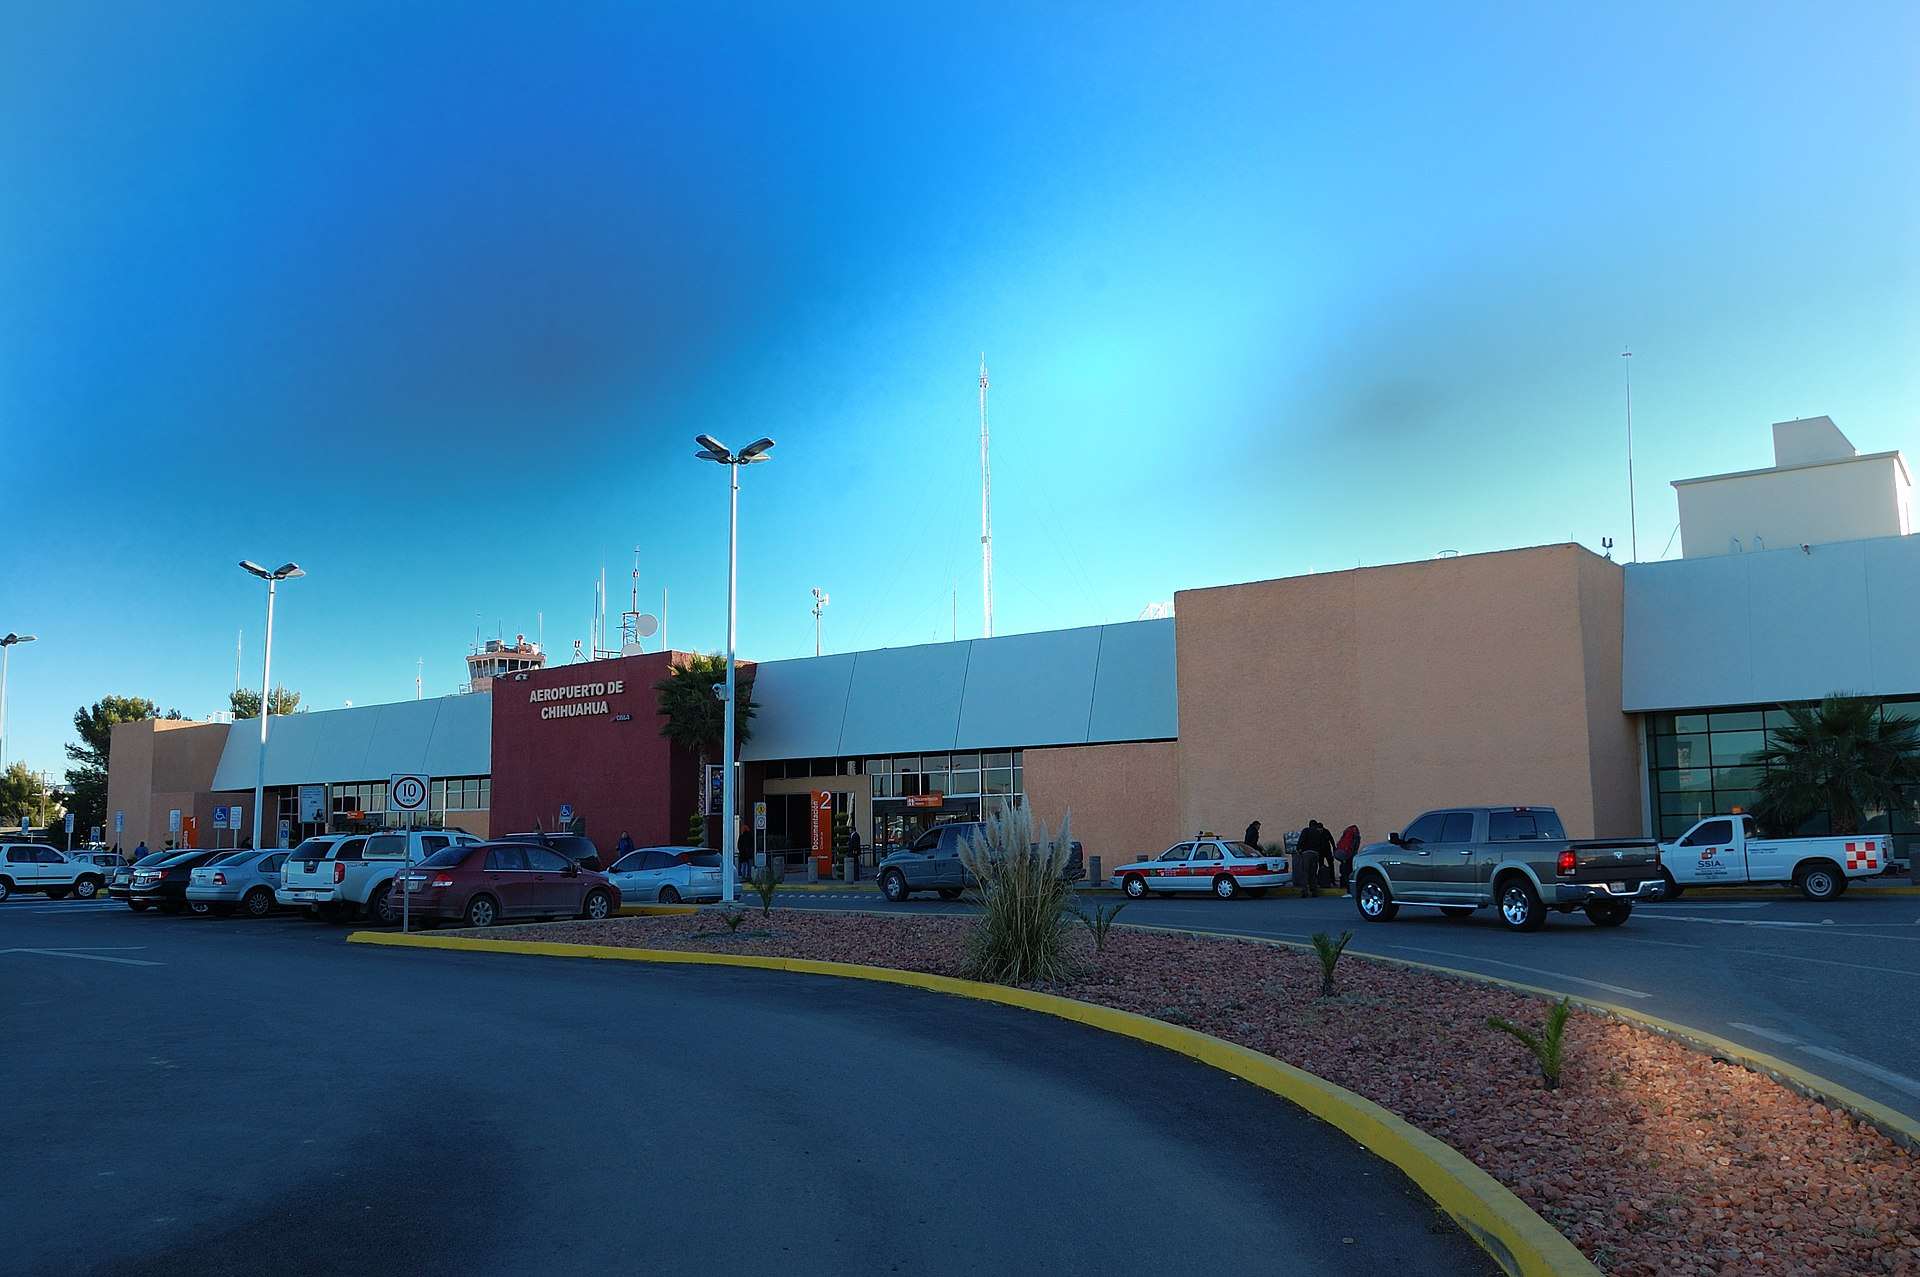 Airport In Juarez Chihuahua Mexico | PETSIDI  |Chihuahua Mexico Airport Sala